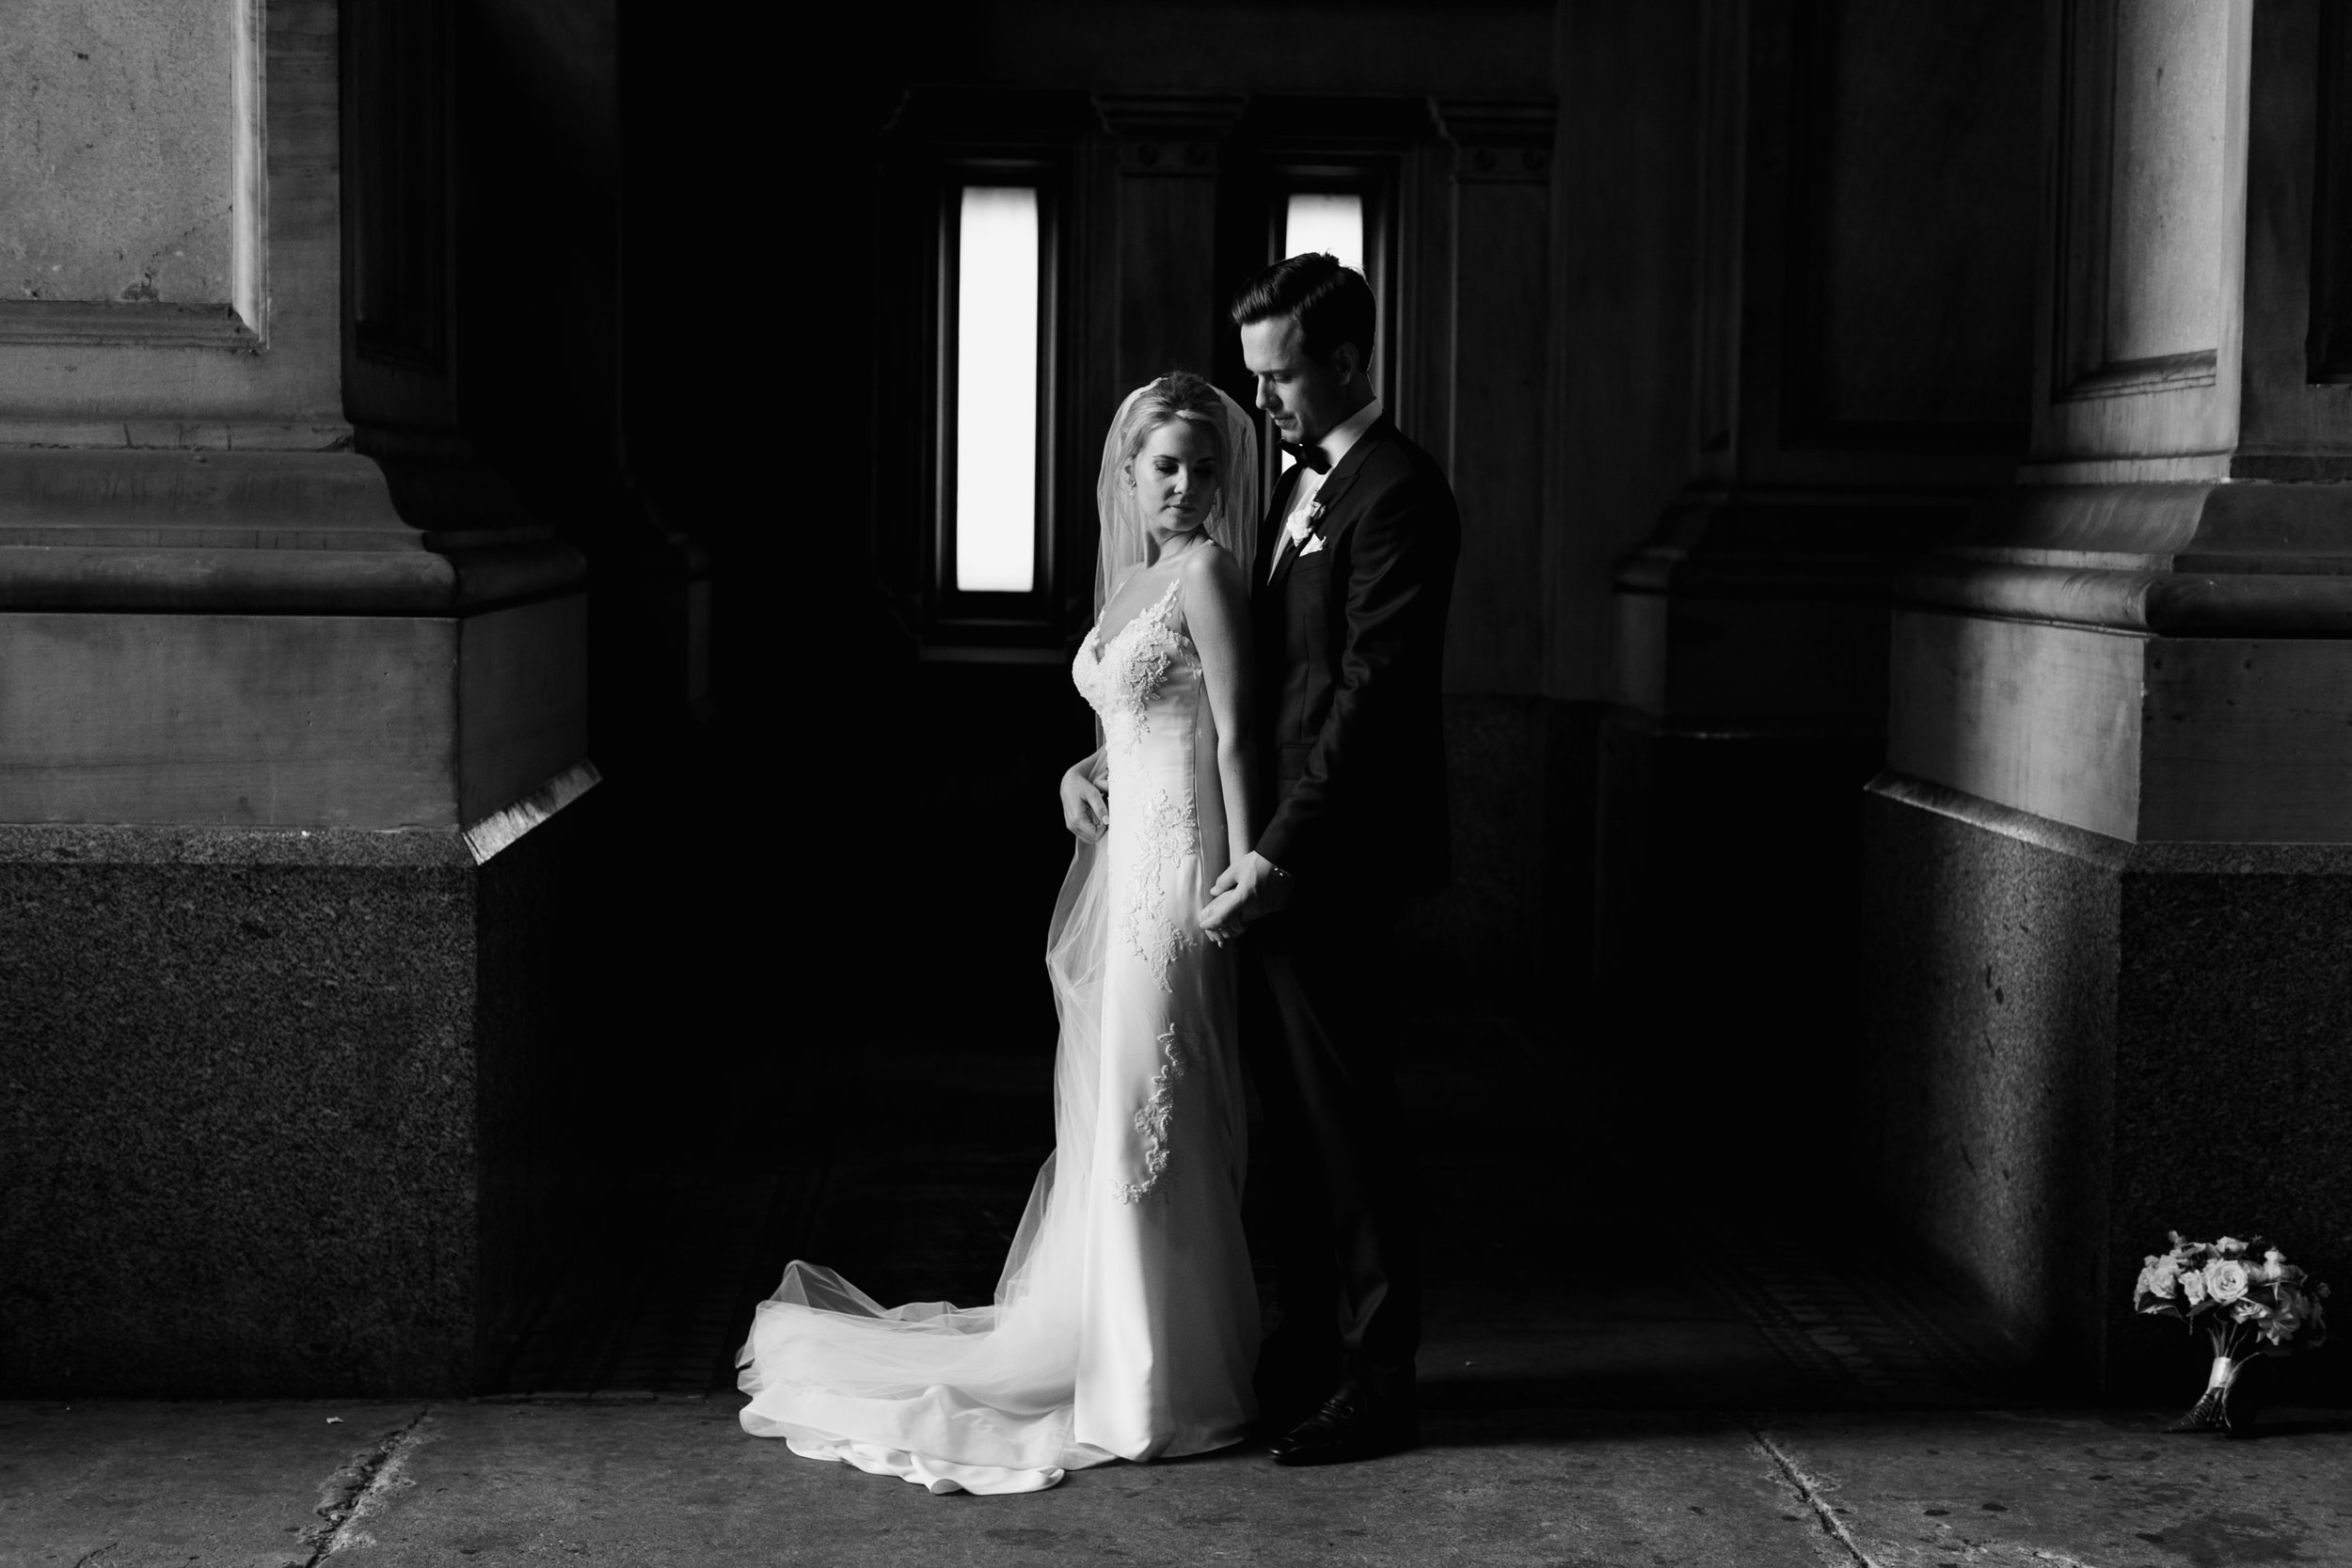 photography-wedding-weddings-natural-candid-union league-philadelphia-black tie-city hall-broad street-editorial-modern-fine-art-03.JPG